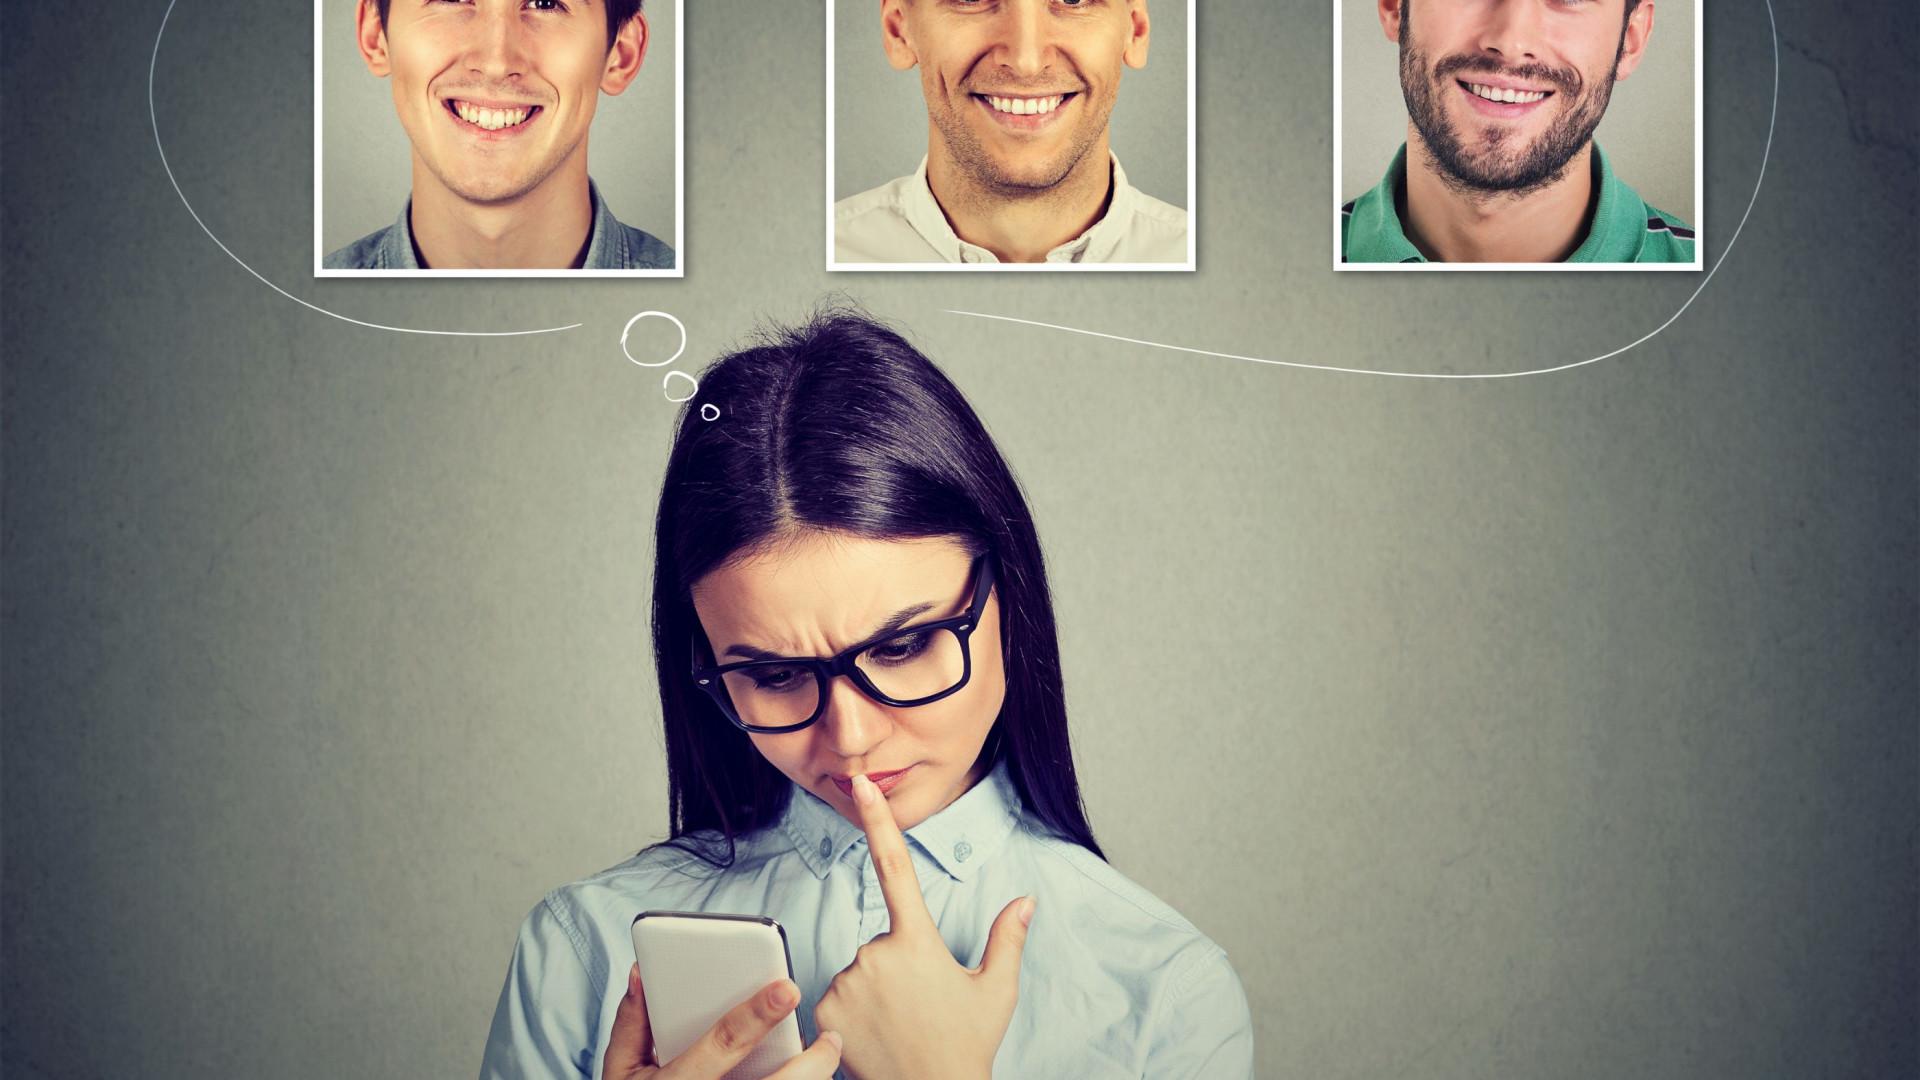 'Fishing': Será esta a nova tendência de namoro online?